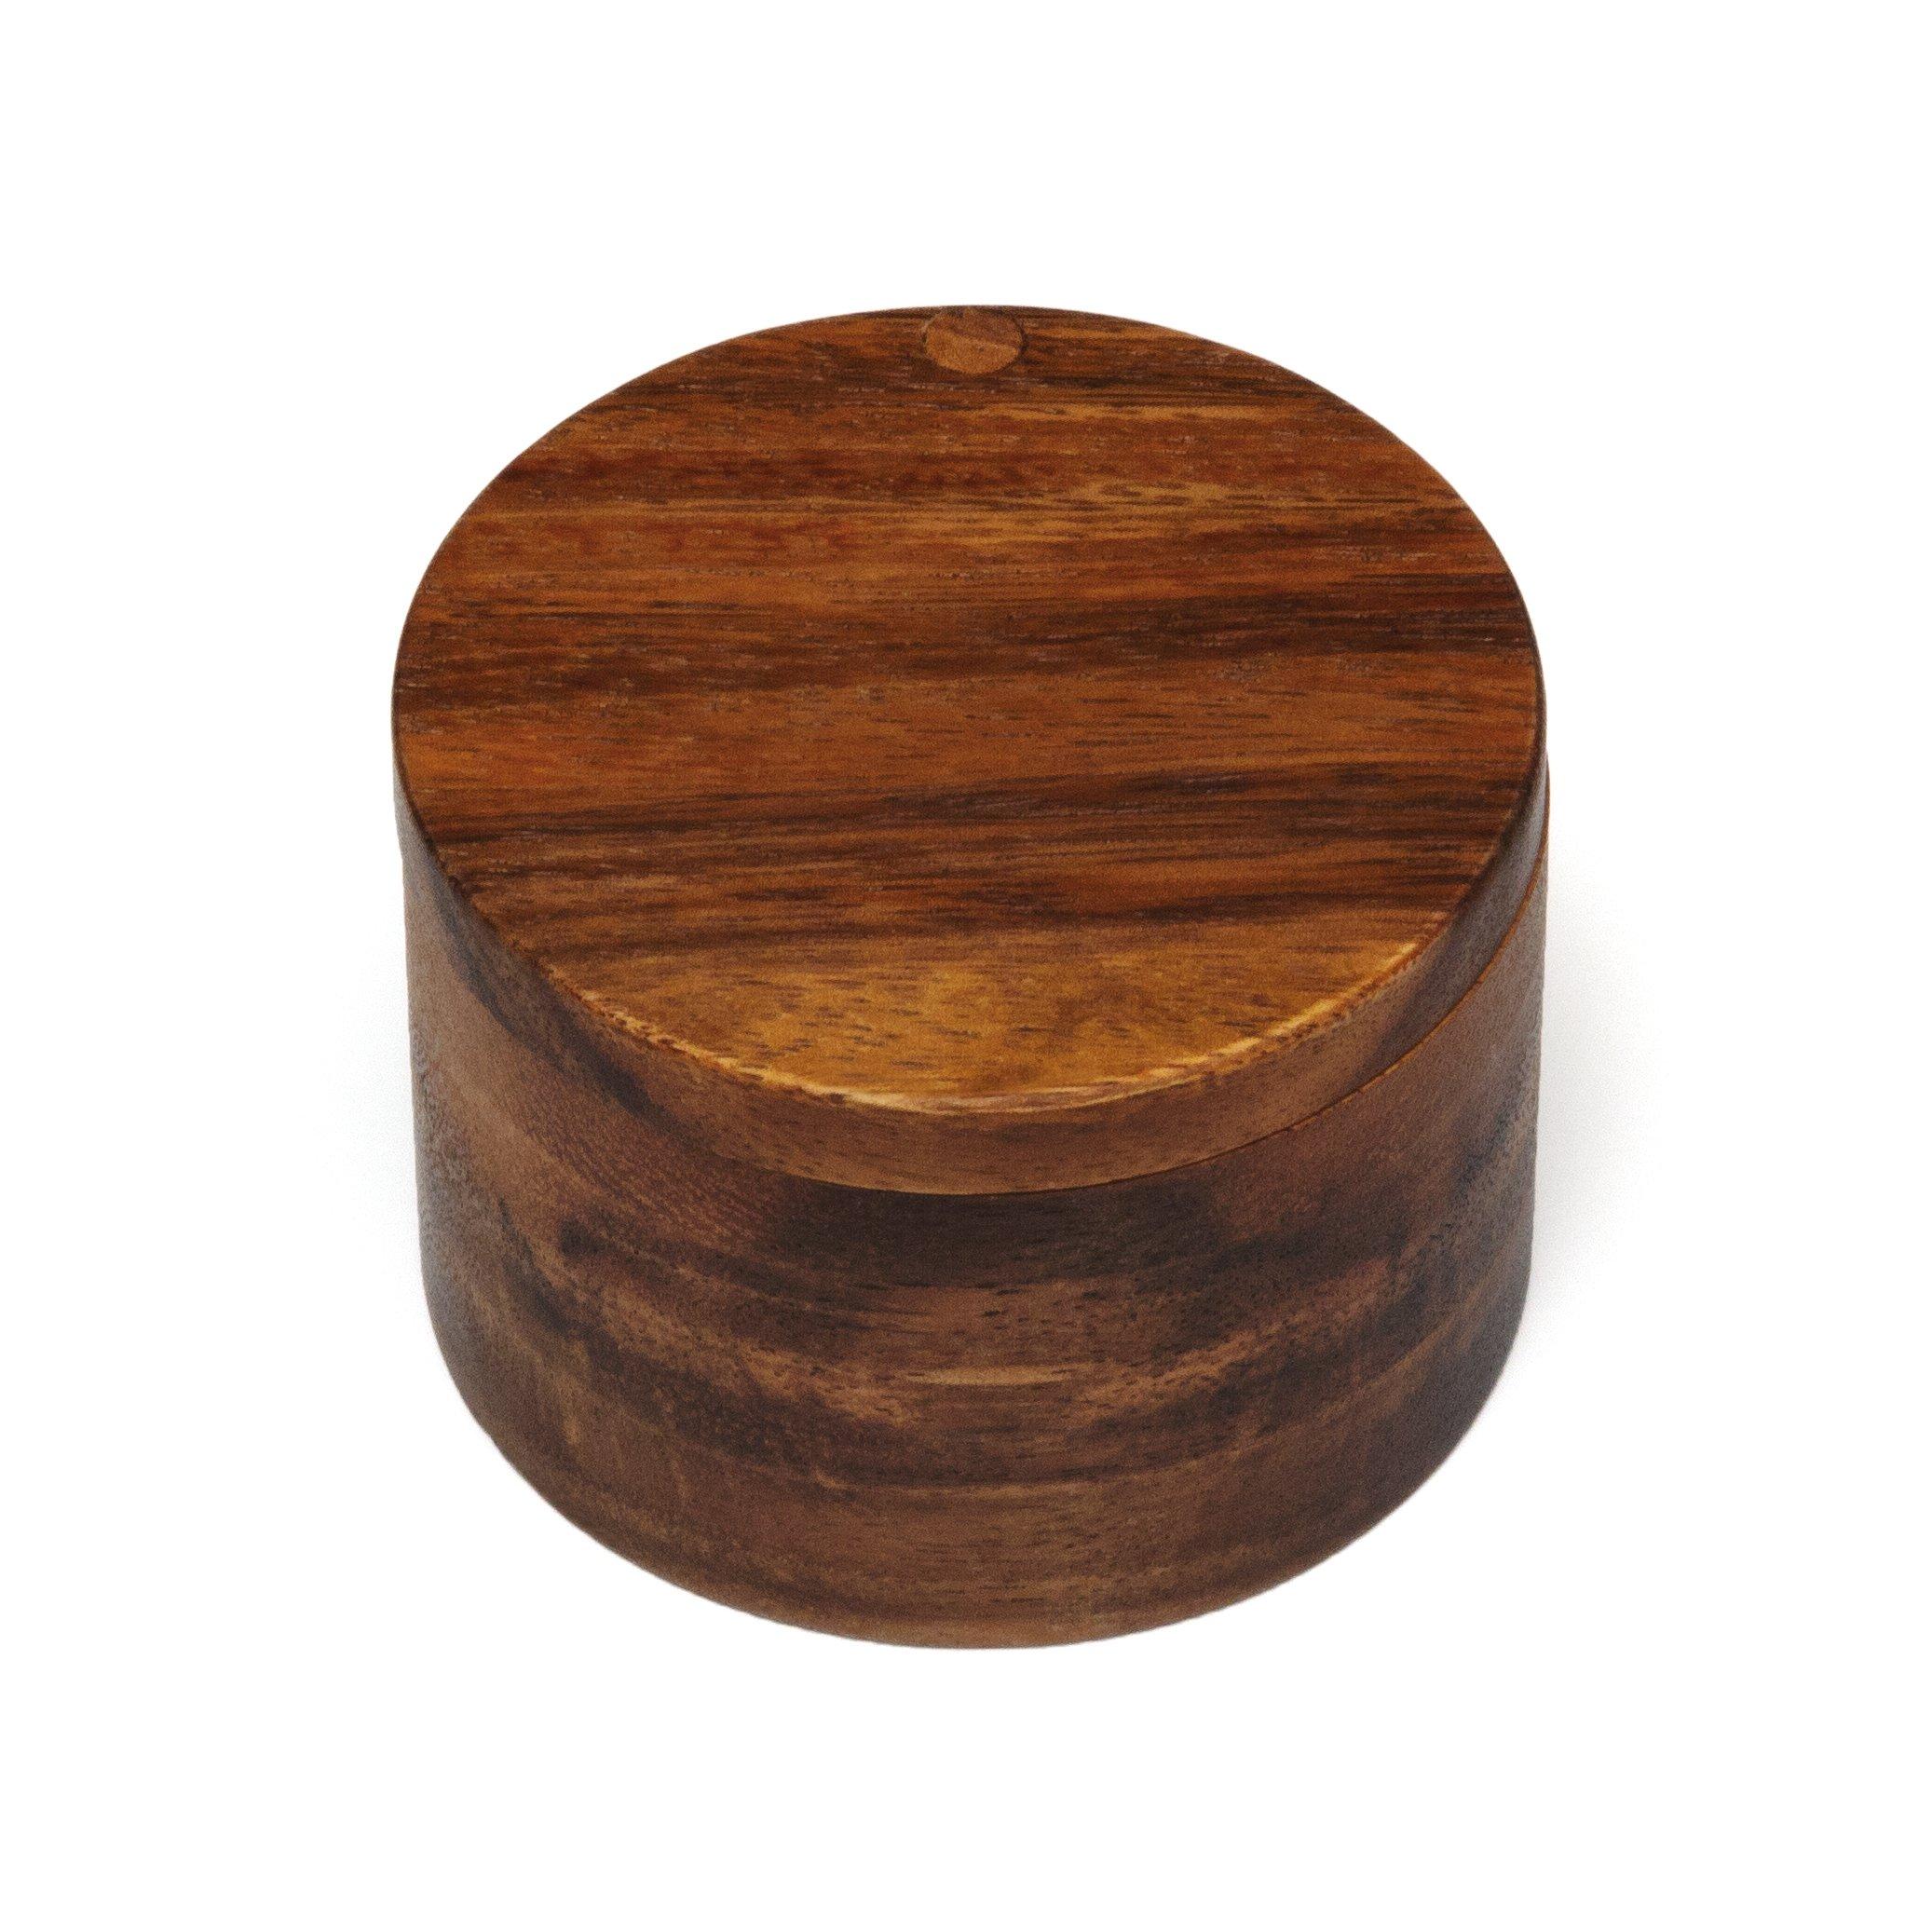 "Lipper International 1126 Acacia Wood Salt or Spice Box with Swivel Cover, 3-1/2"" x 2-1/2"""